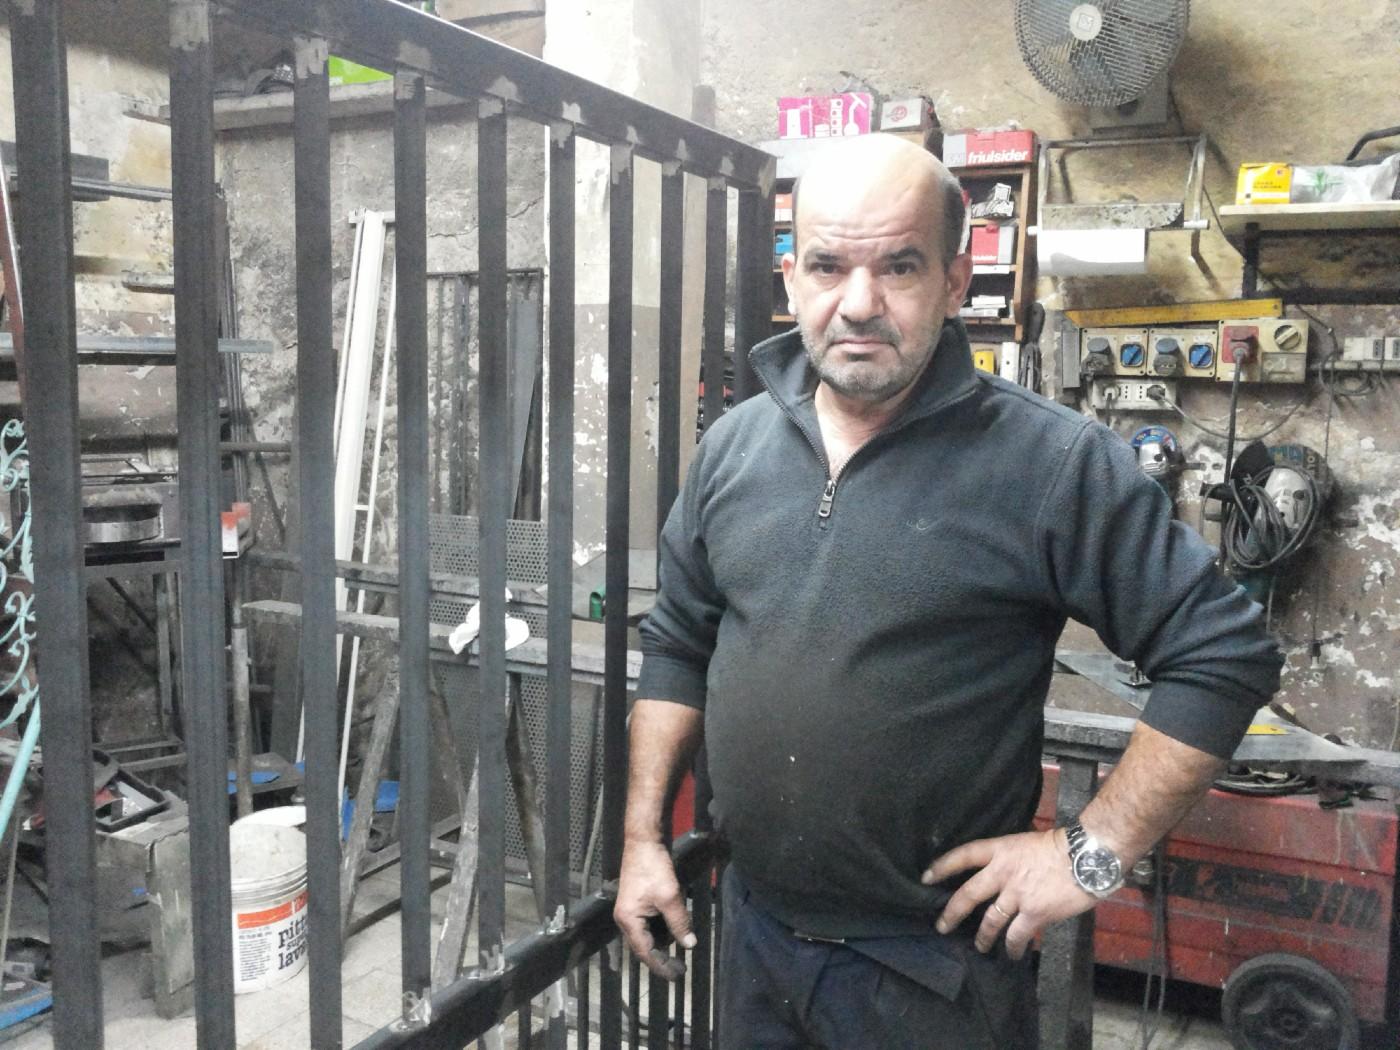 Antonio Salis, su maistru de ferru